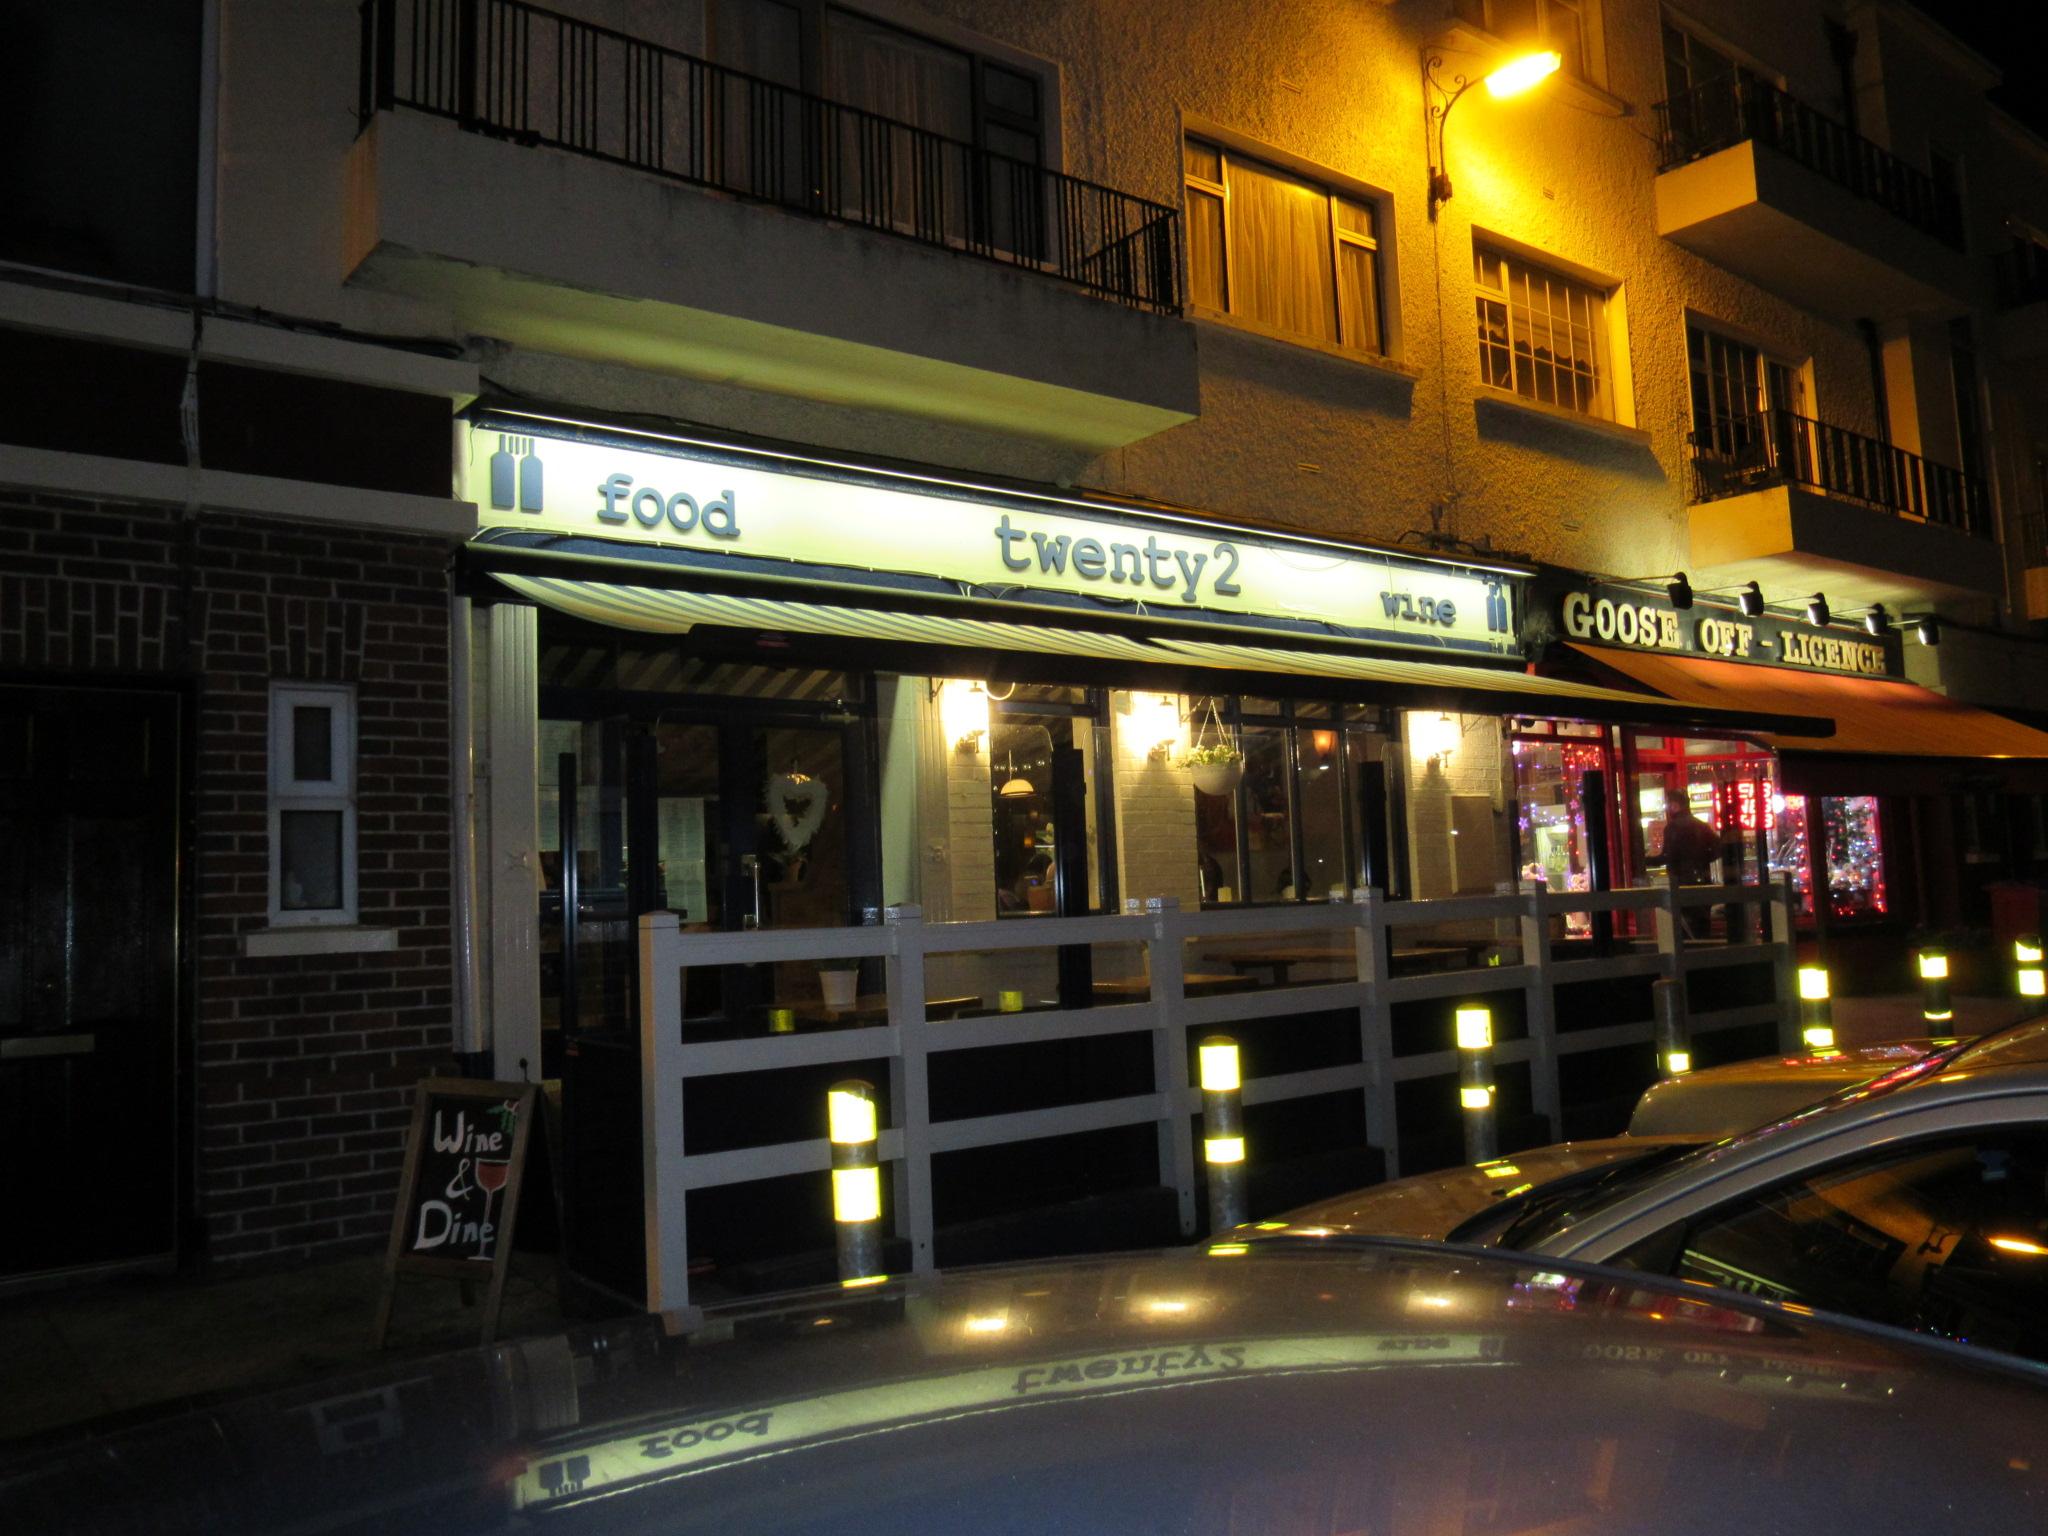 twenty2 restaurant, dublin 9